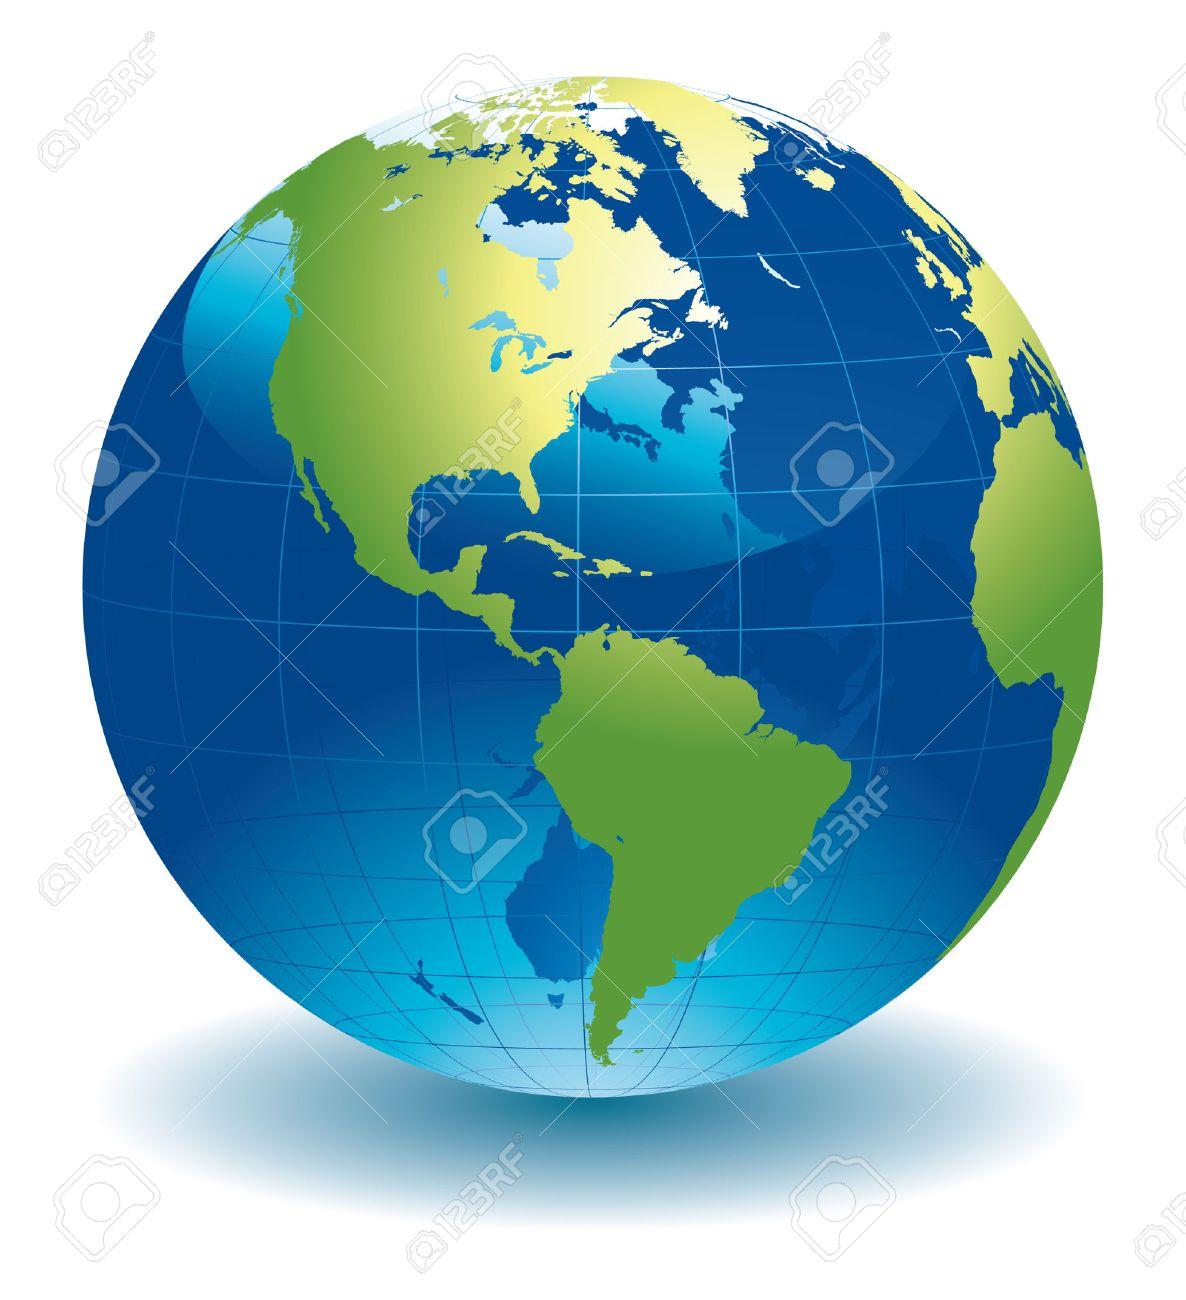 World Globe Map Royalty Free Cliparts Vectors And Stock - Earth globe map